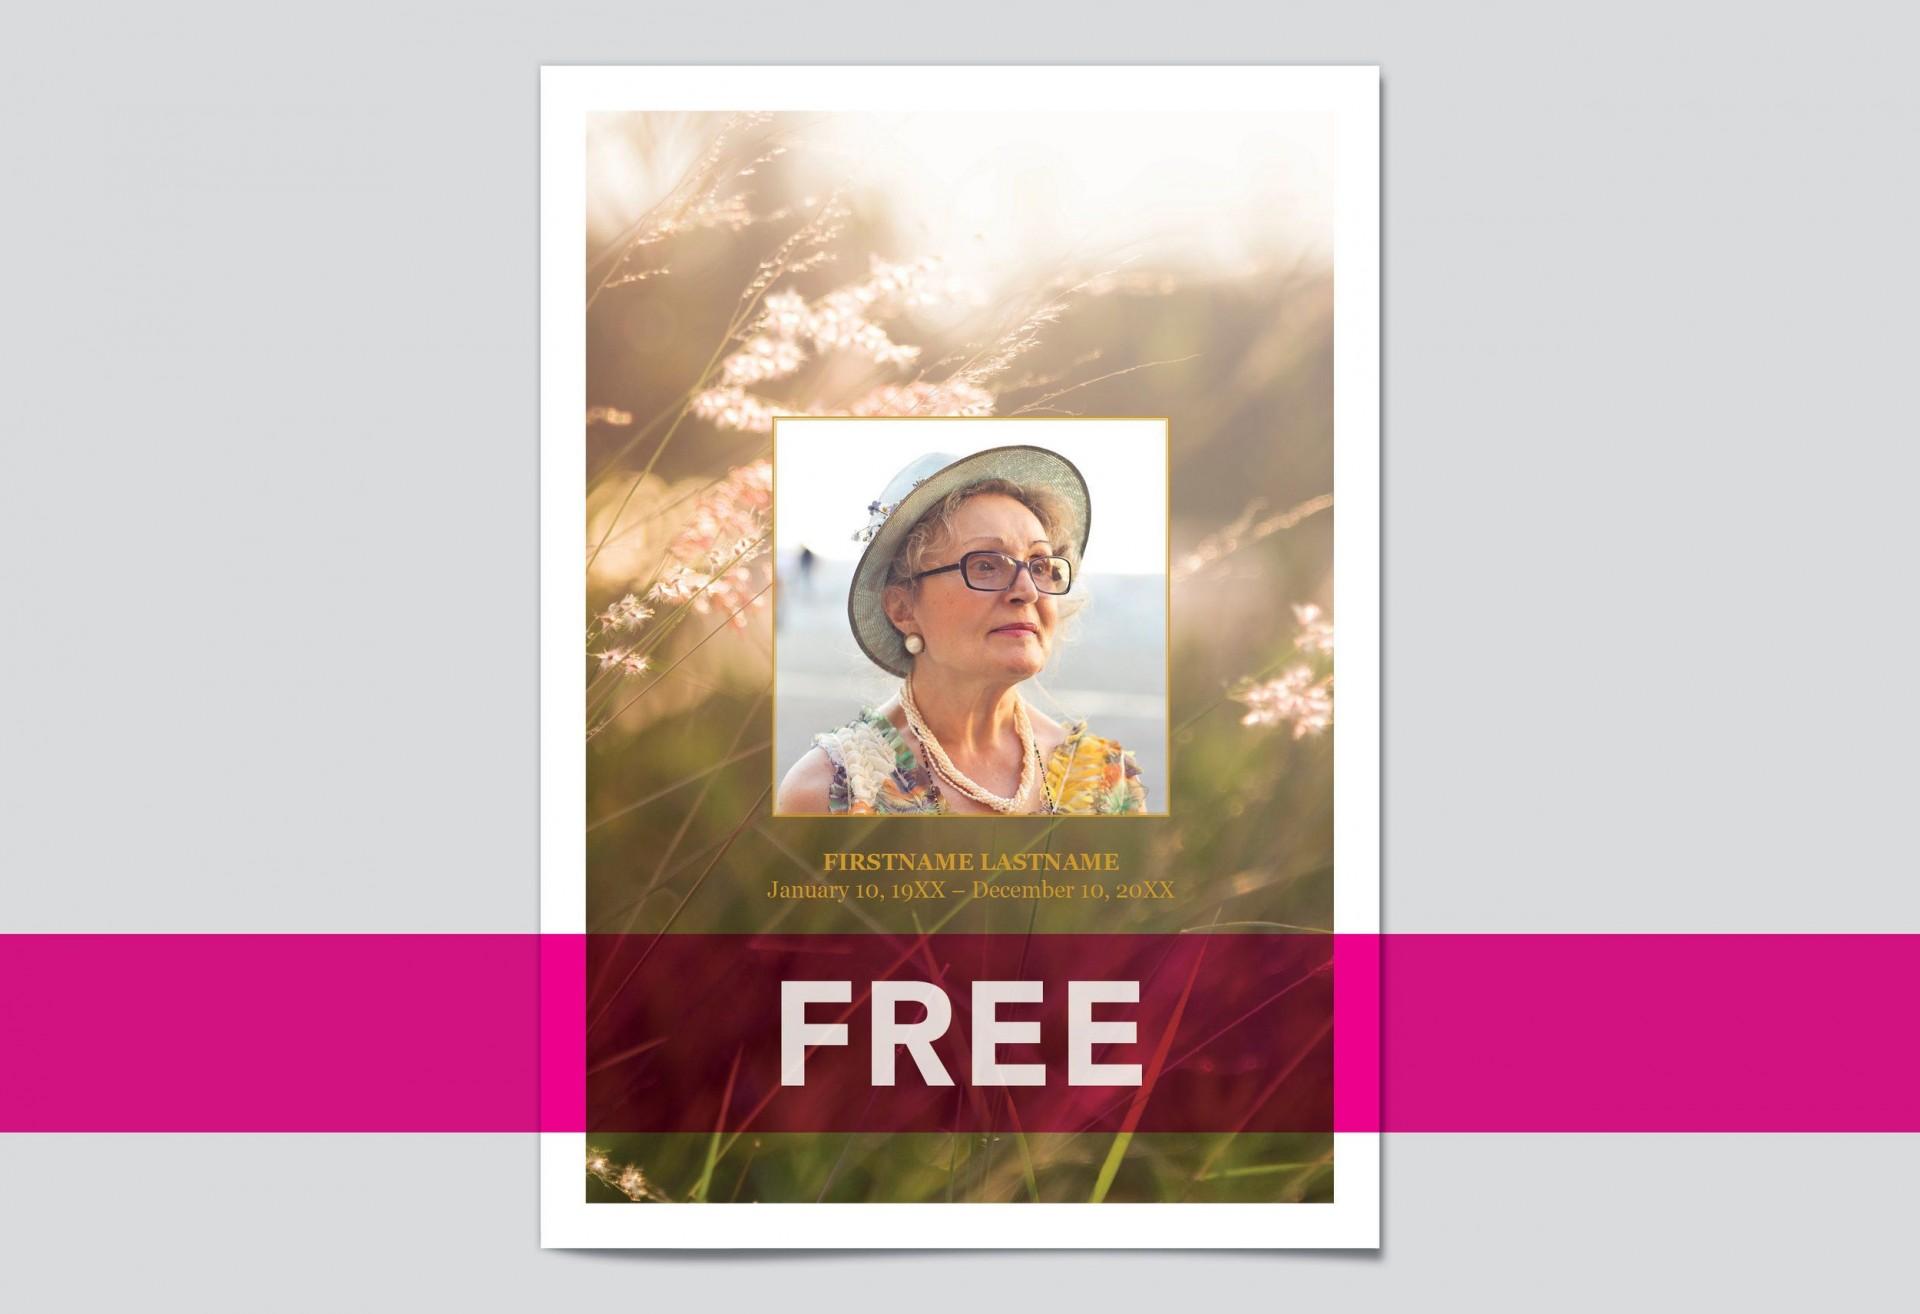 010 Best Celebration Of Life Announcement Template Free Picture  Invitation Download Invite1920